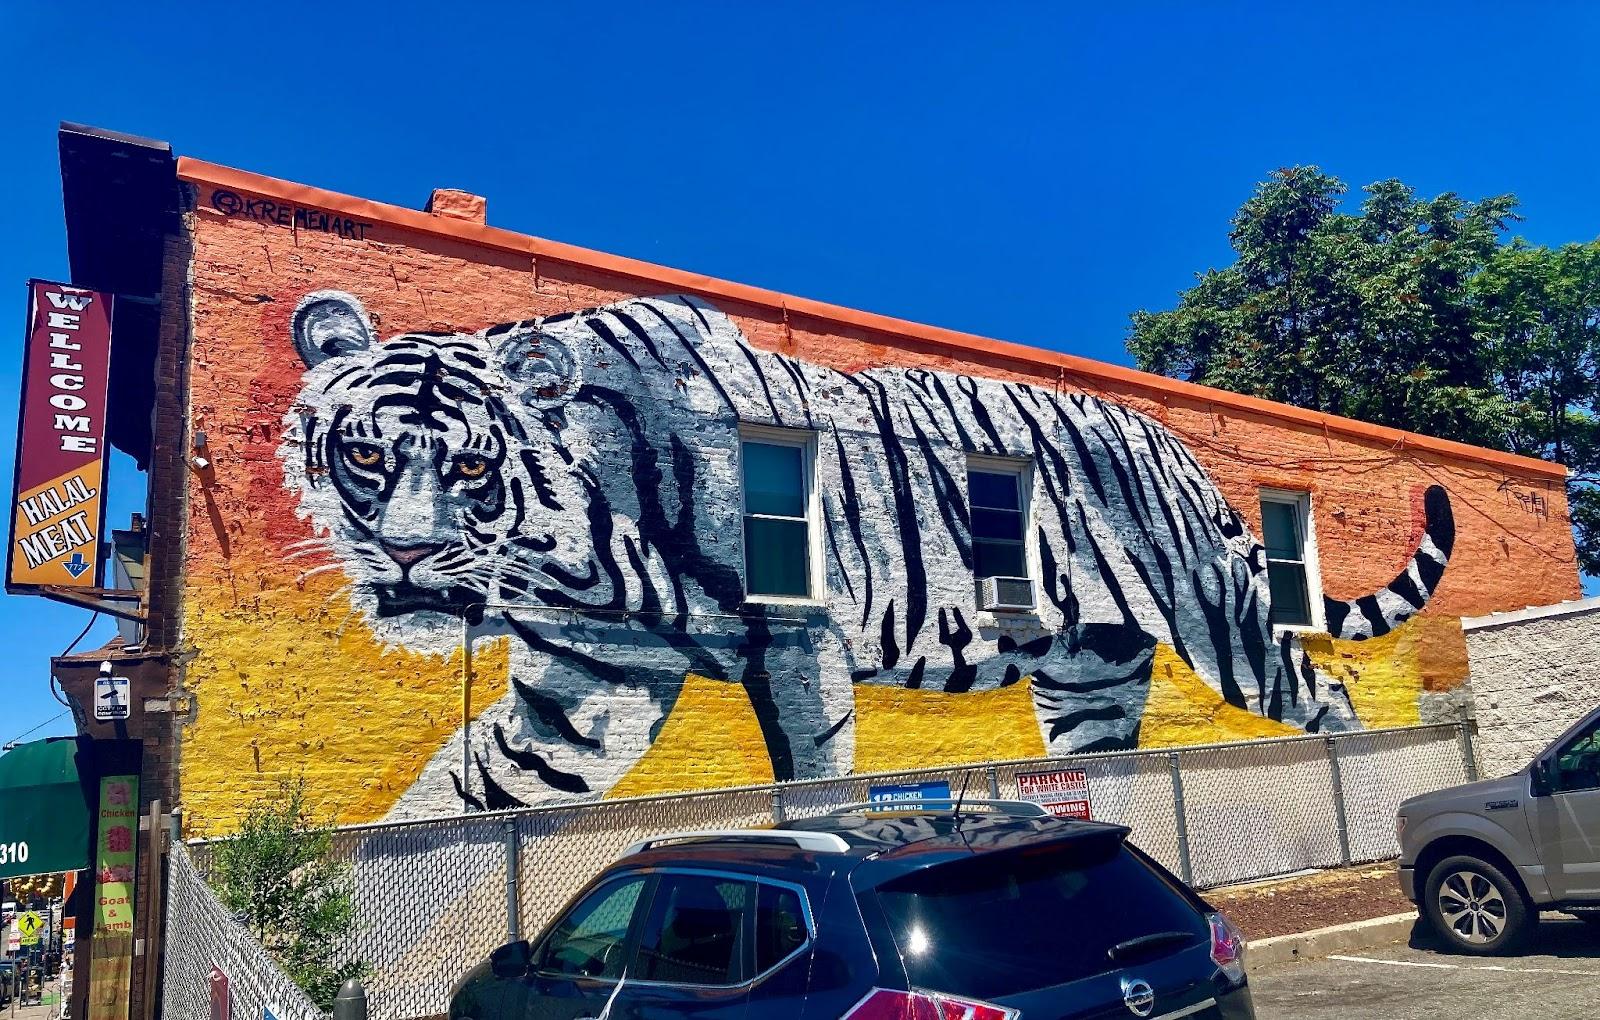 "Inside Look at Jersey City's Burgeoning Street Art. ""Sunset Tiger"" by Kremen Art. 2995 John F. Kennedy Blvd. Photo by Vittoria Benzine."